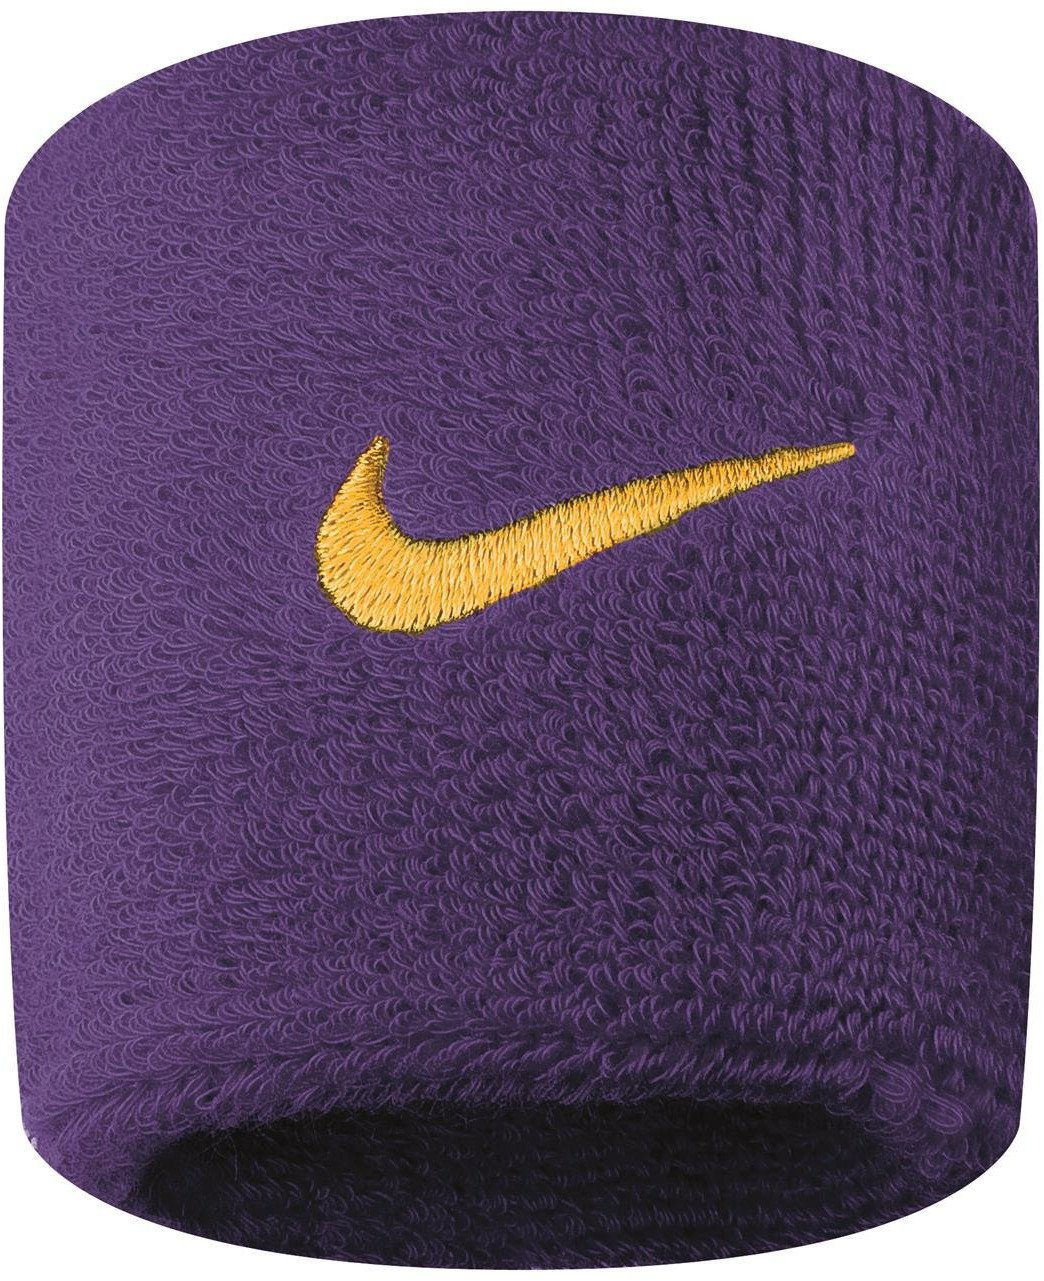 Potítka Nike Swoosh 9c10cacb7e